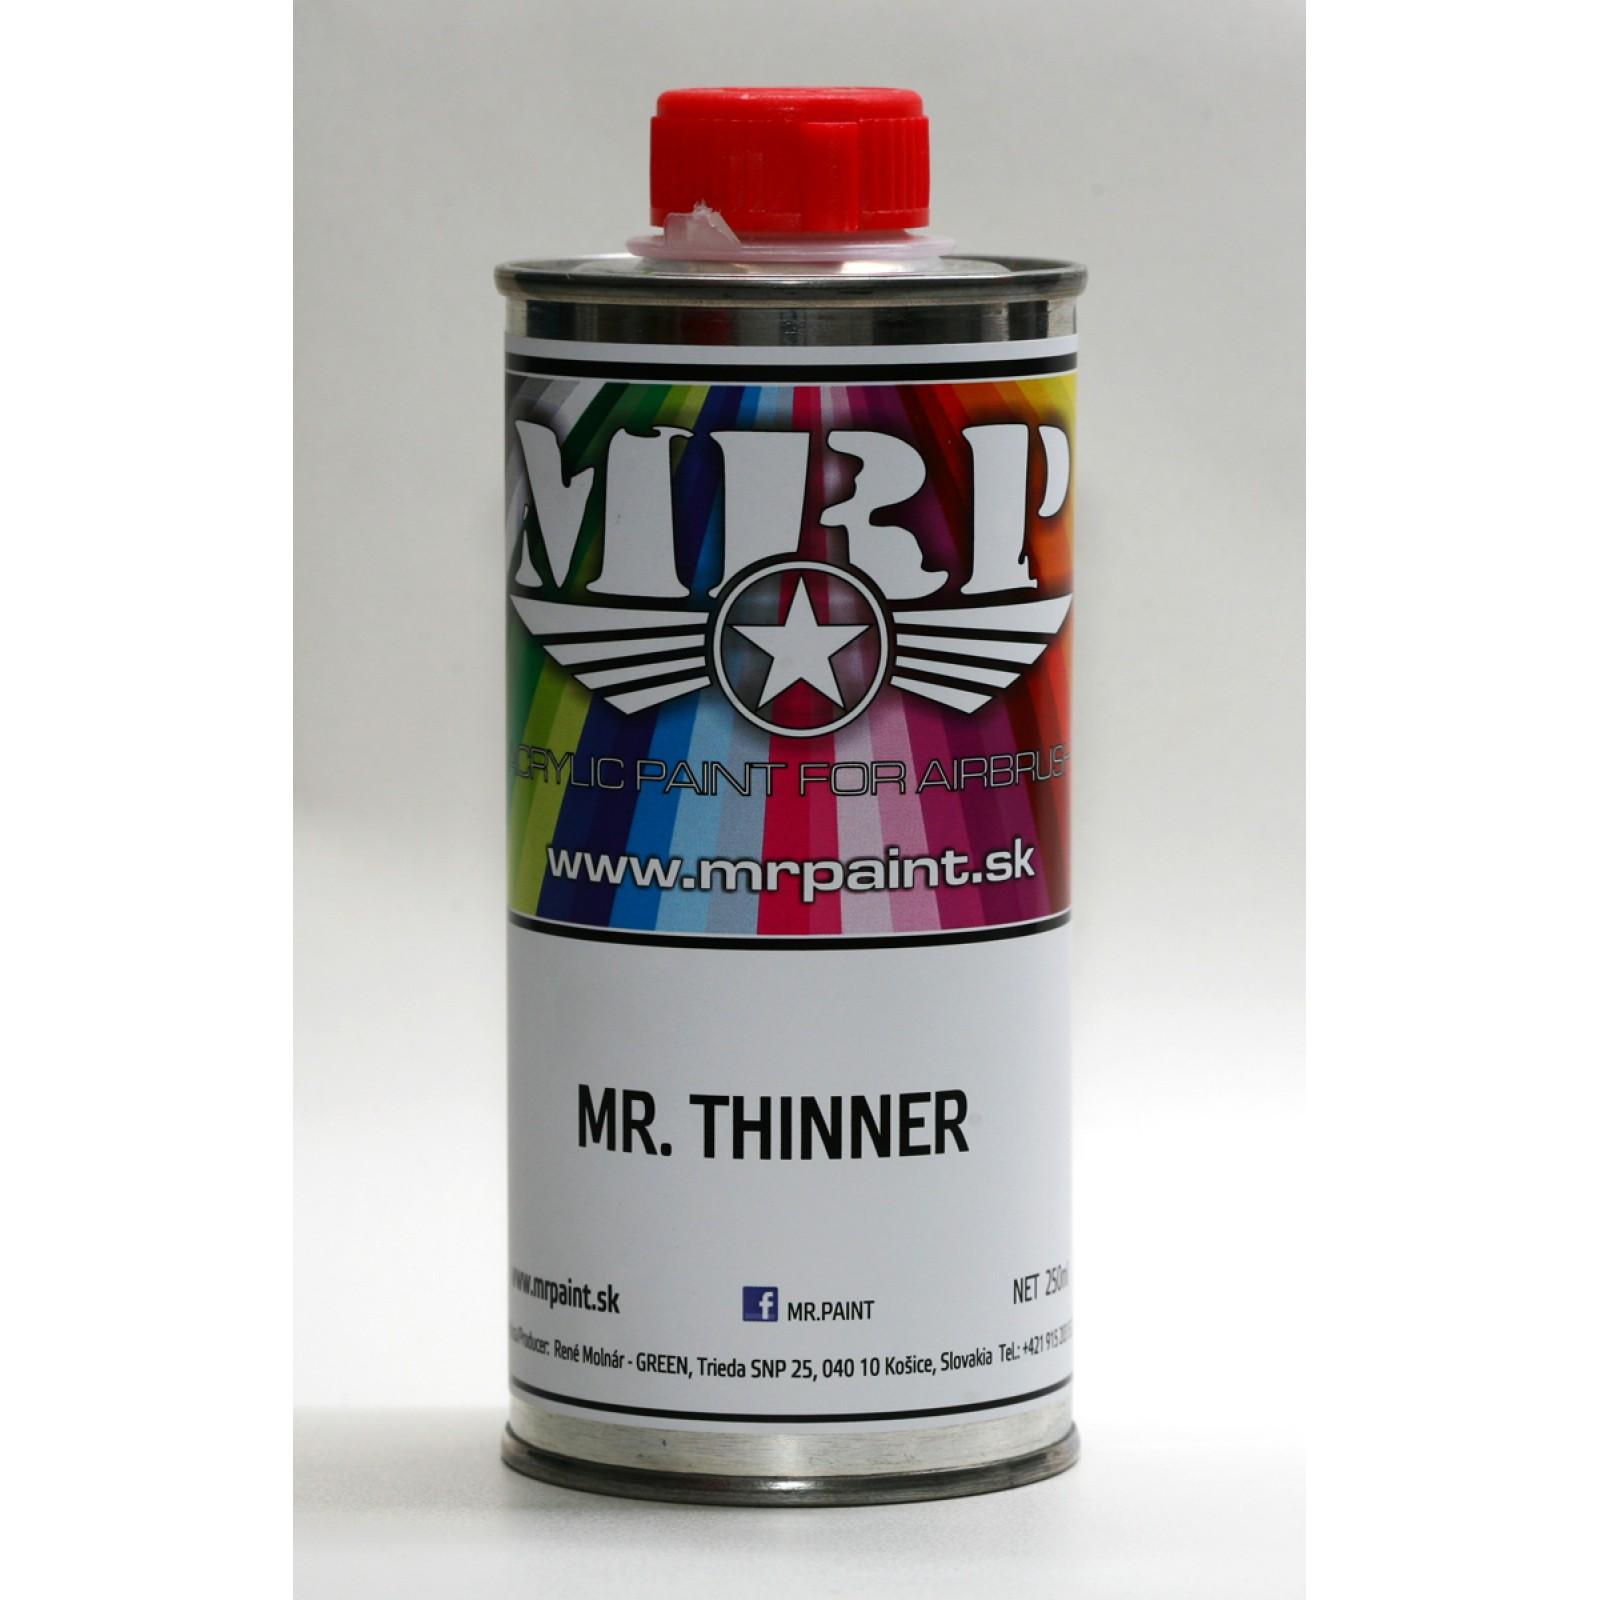 MR. THINNER